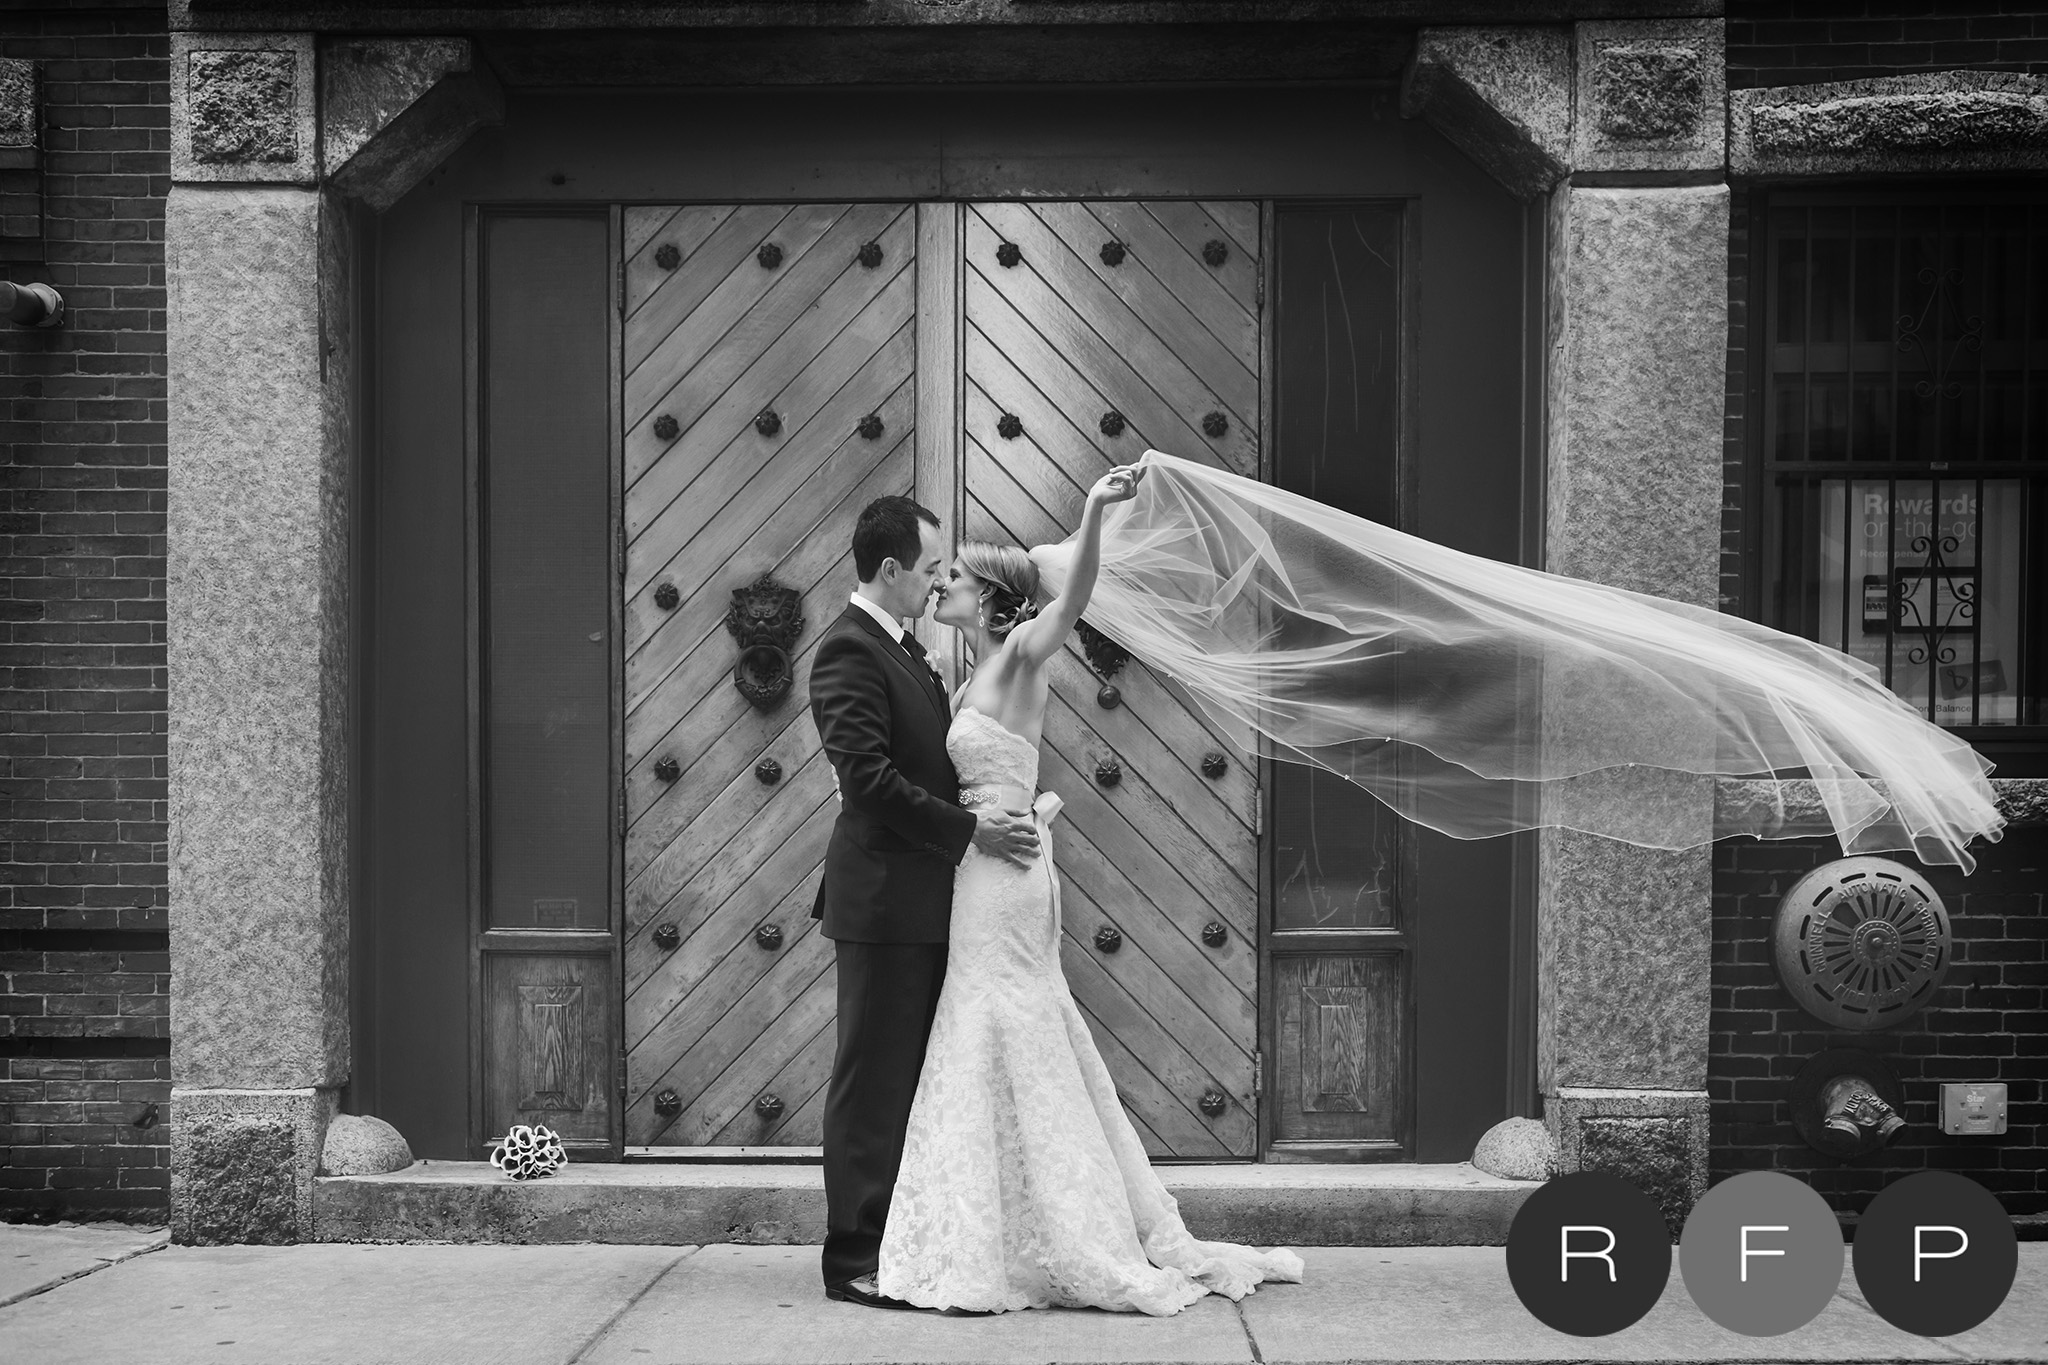 boston and new england wedding photography resources roberto